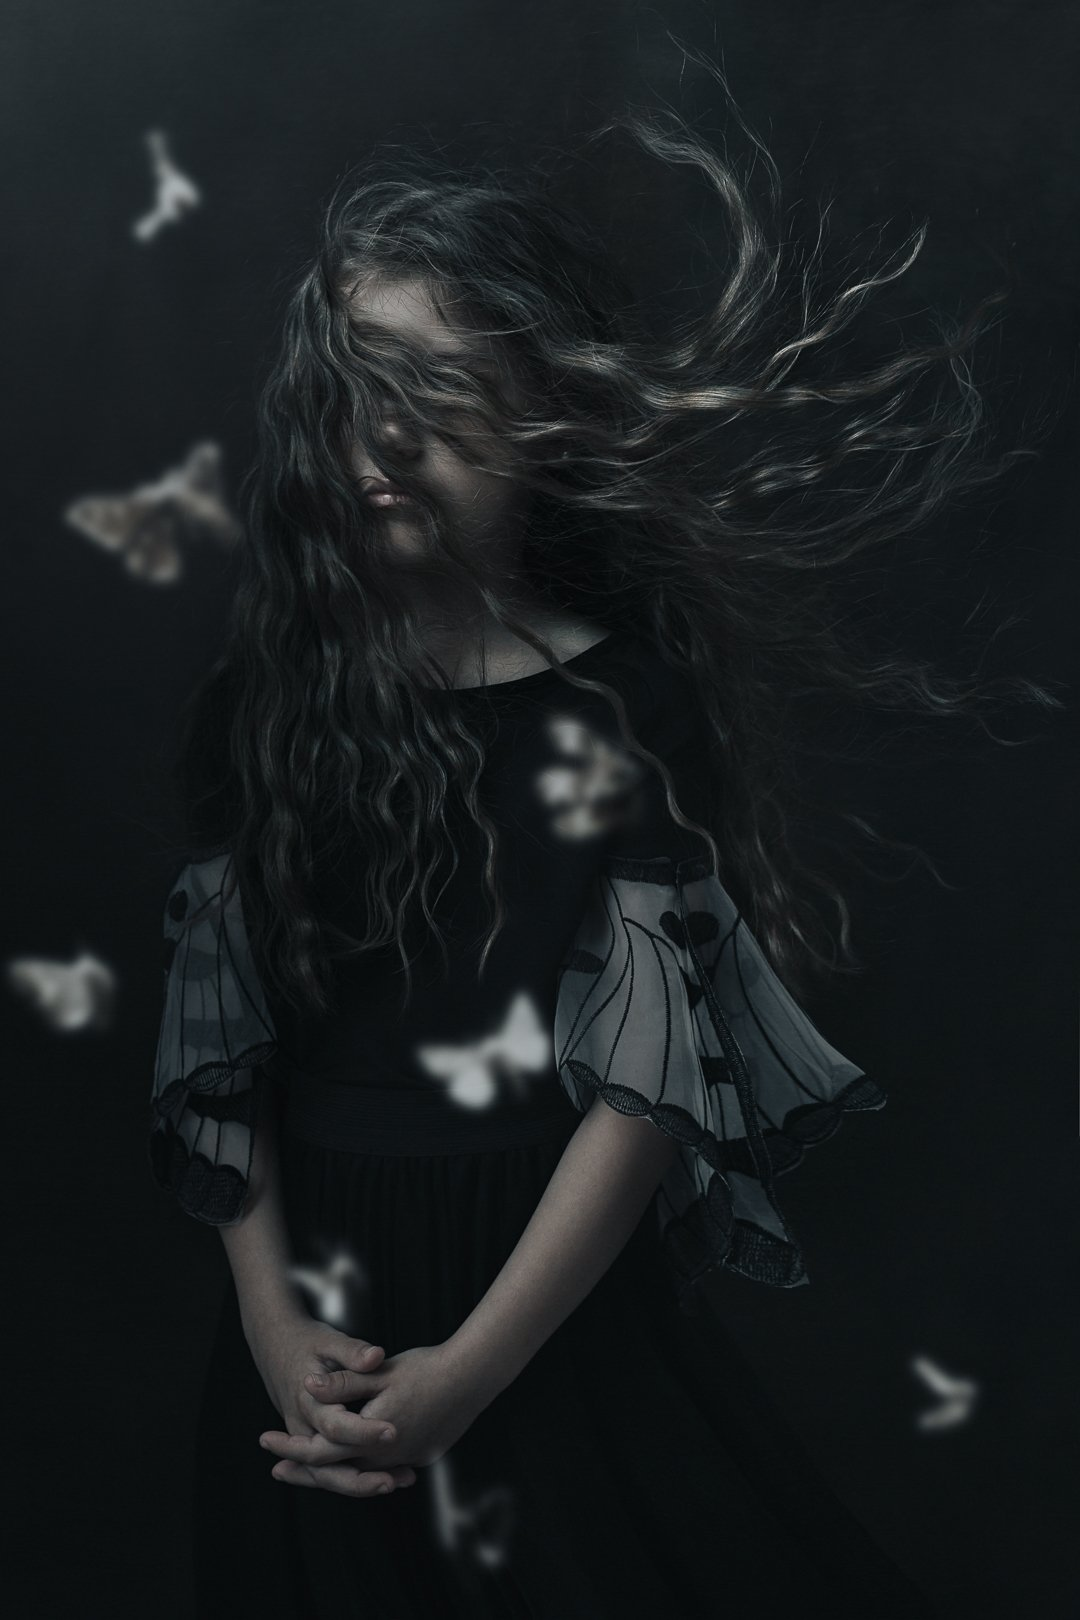 девочка портрет кудри волосы girl portrait hair moths moth butterfly бабочки мотылёк, Баласюк Вероника